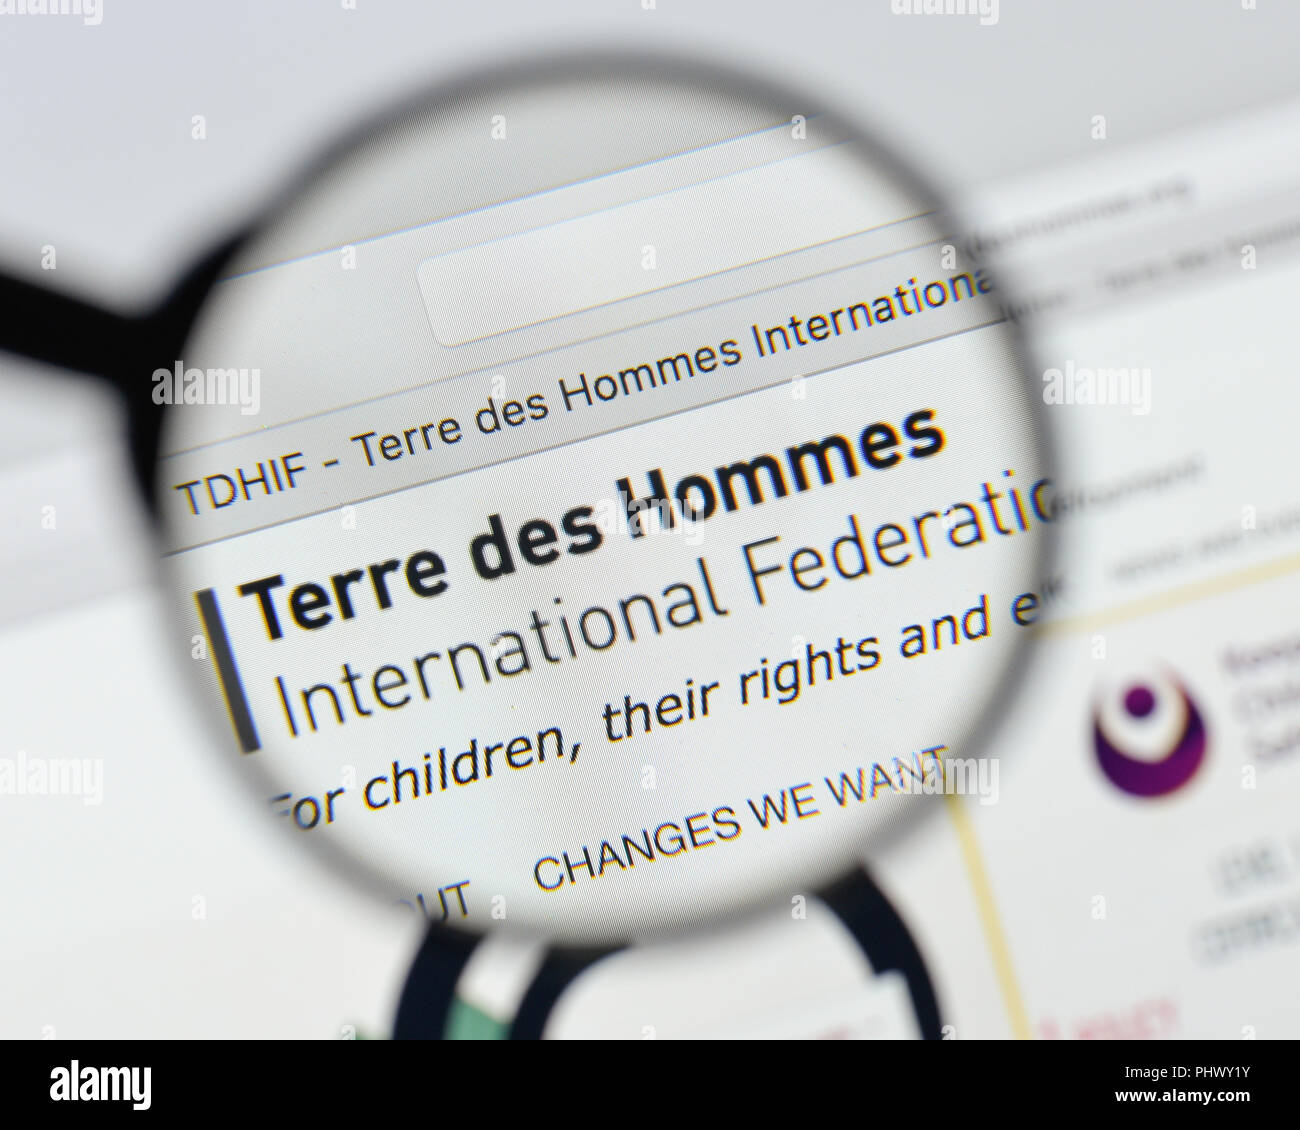 Milan, Italy - August 20, 2018: Terre des Hommes International Federation website homepage. Terre des Hommes International Federation logo visible. - Stock Image